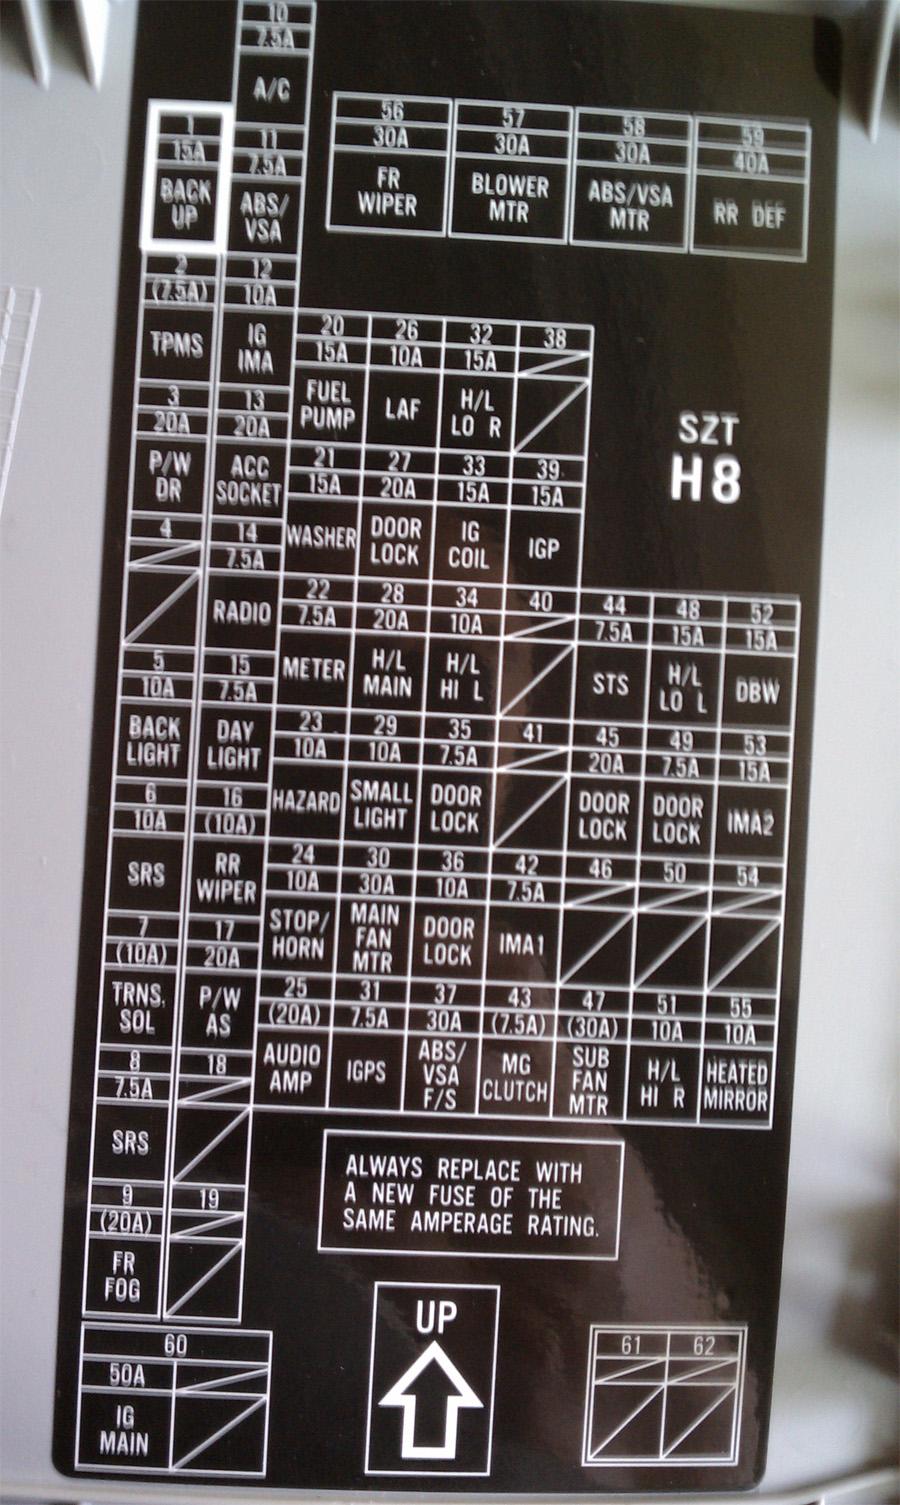 94 honda civic fuse panel diagram ff 9192  fuse box additionally 94 honda accord fuse box diagram on  honda accord fuse box diagram